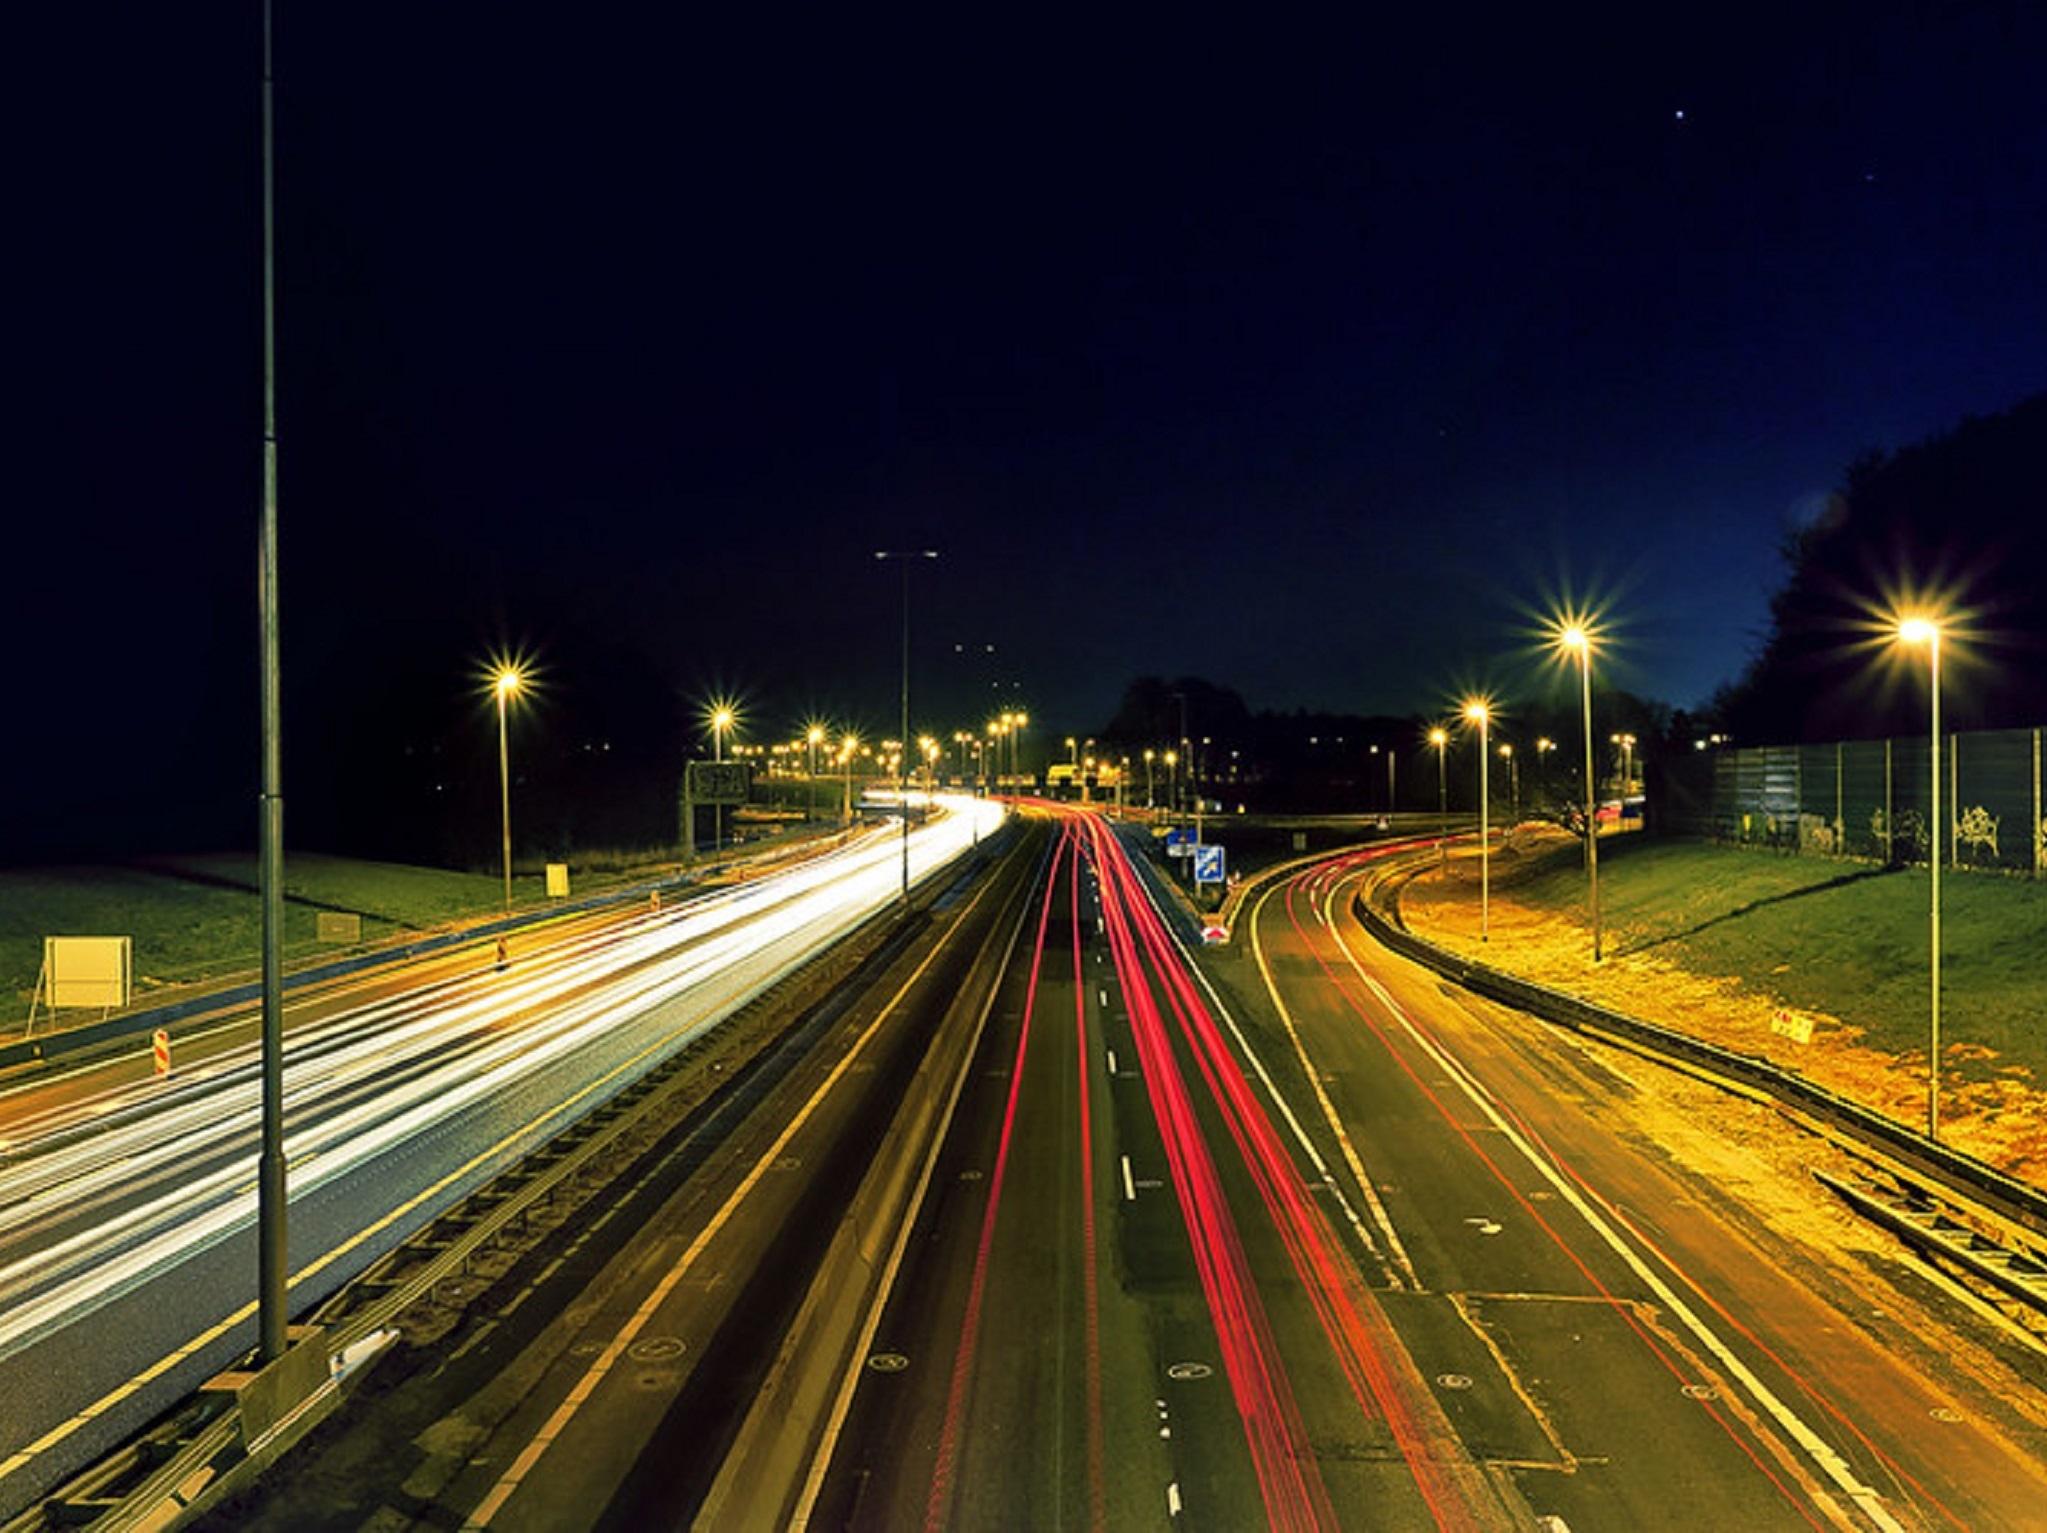 A highway at night